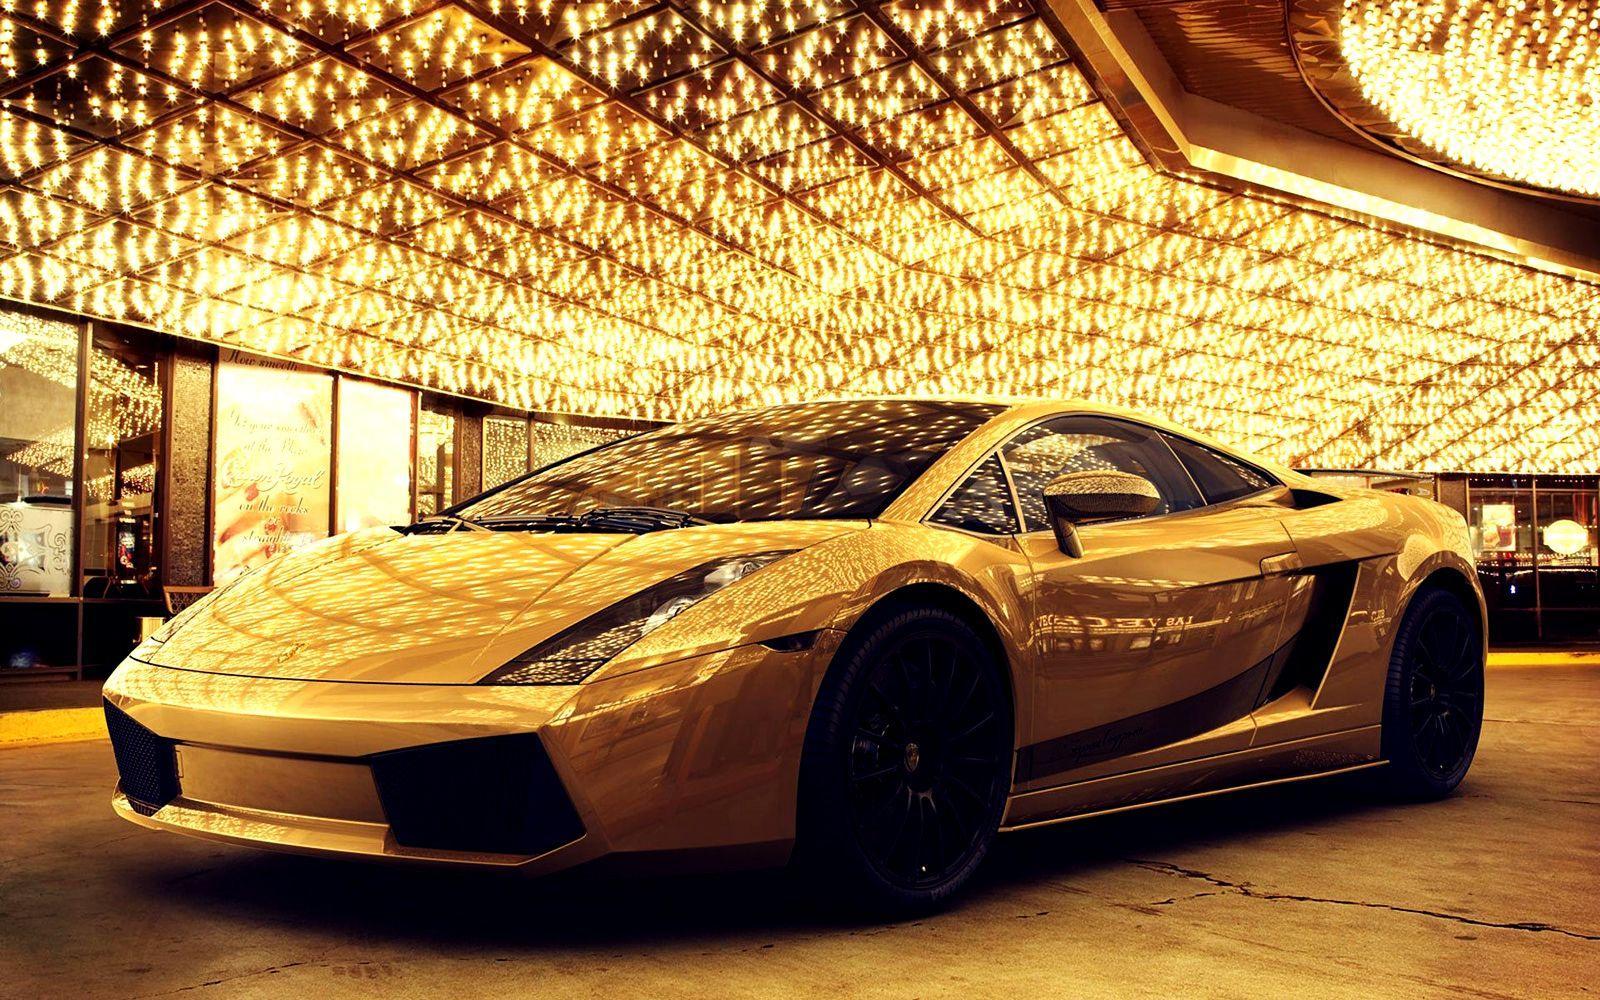 Gold Car Wallpapers - Wallpaper Cave